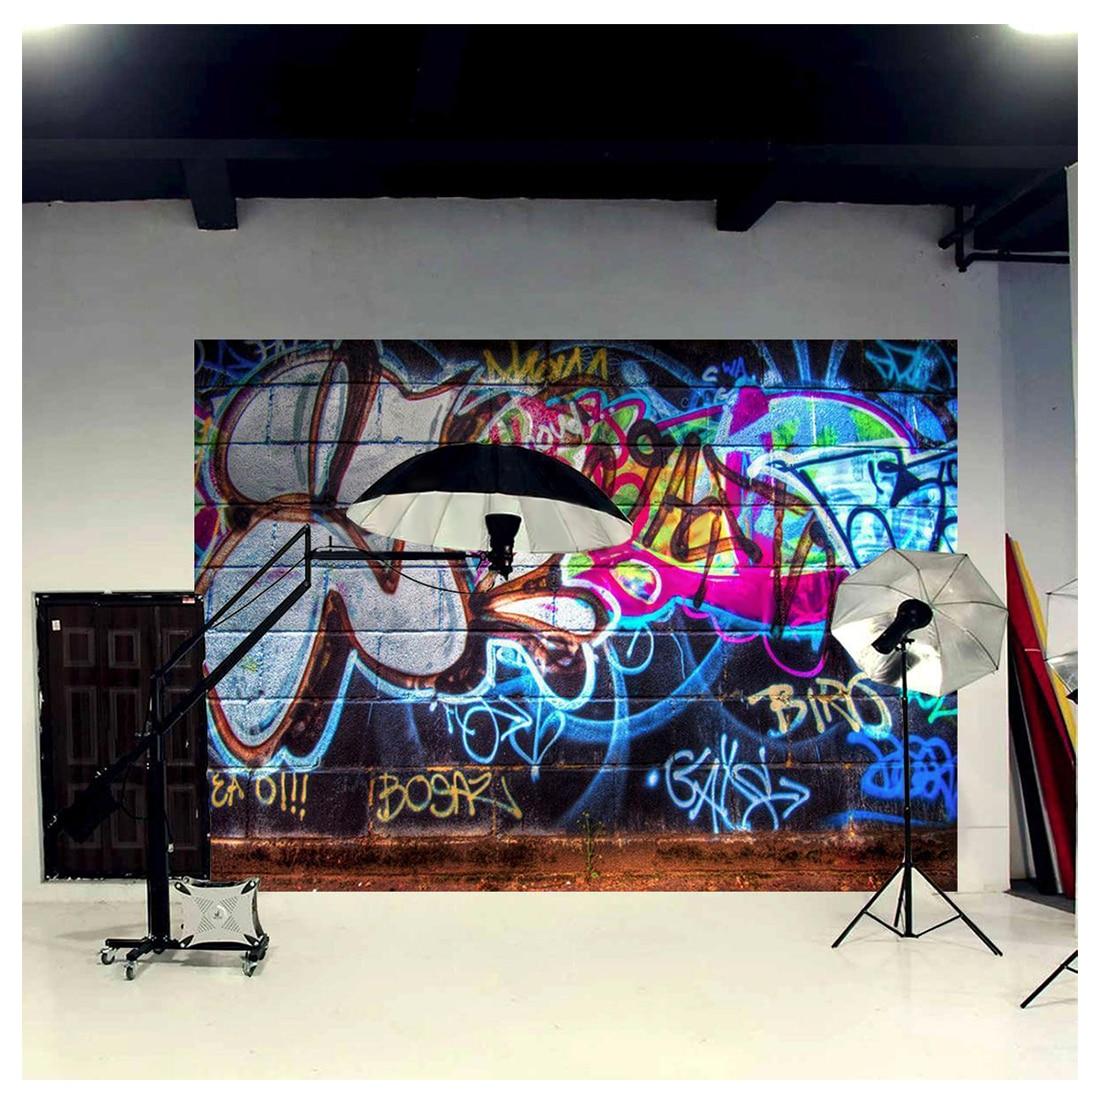 Graffiti wall vinyl - Graffiti Wall Background